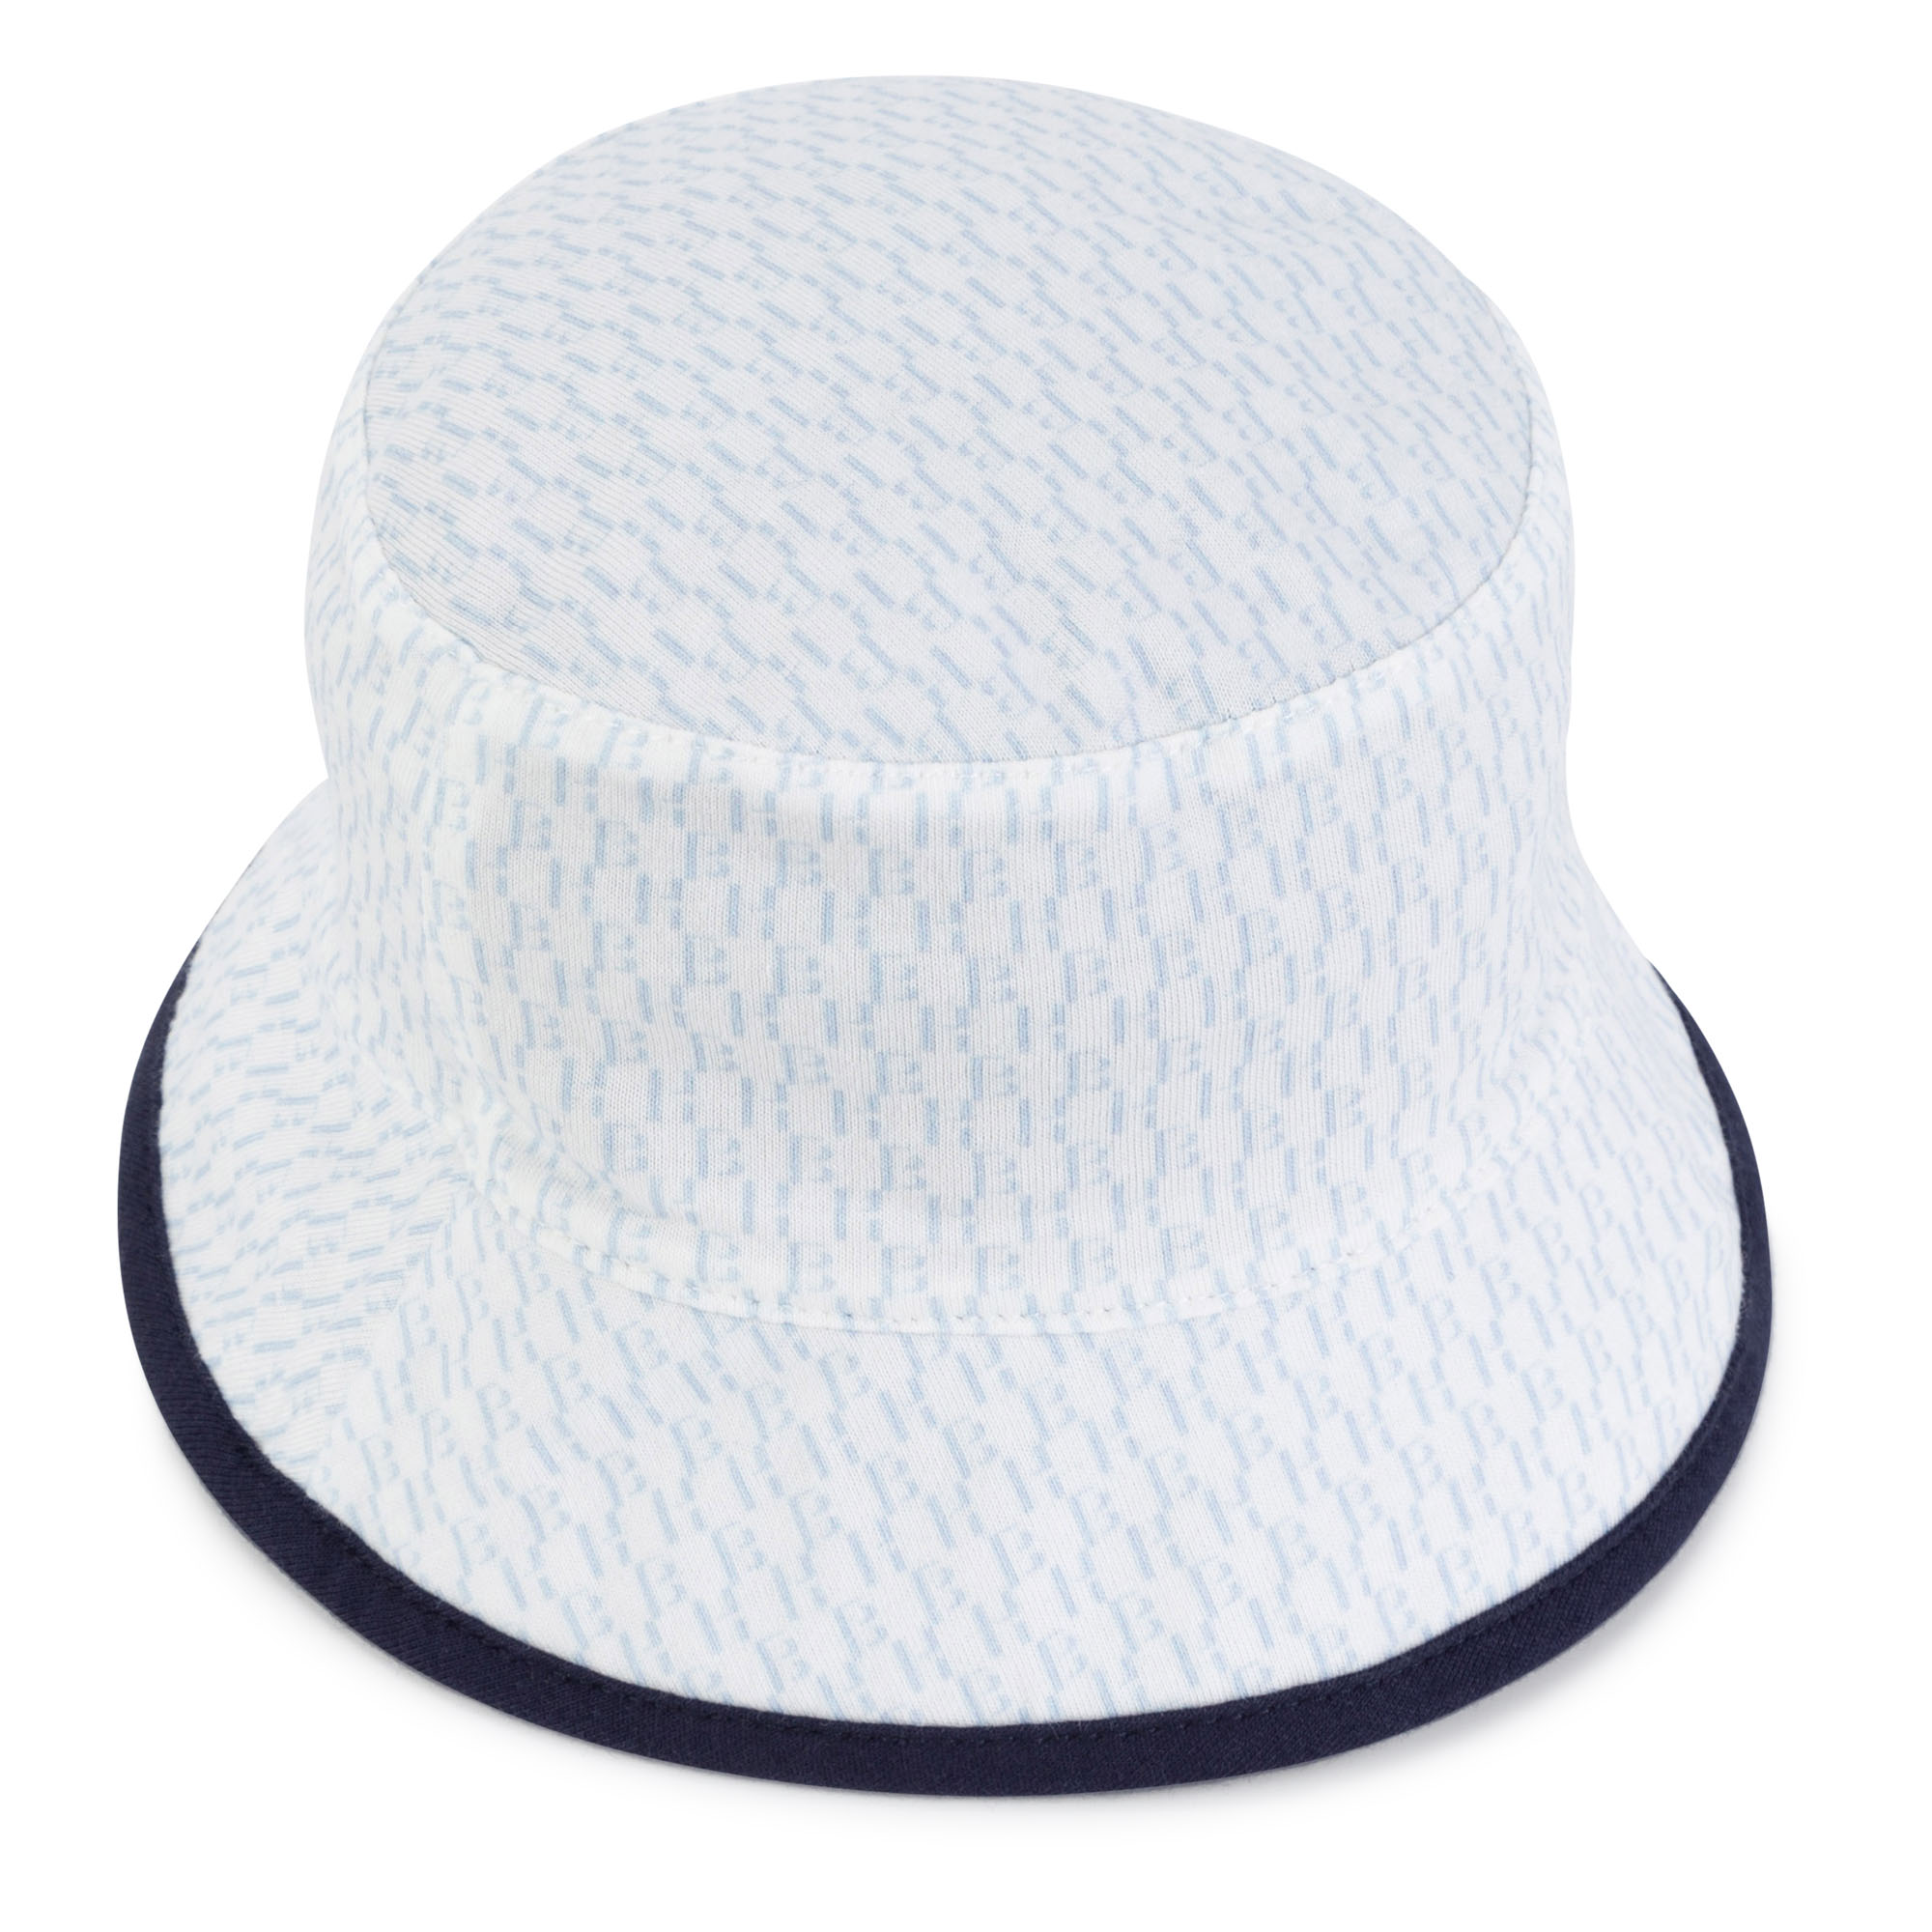 Cotton jersey bucket hat BOSS for BOY